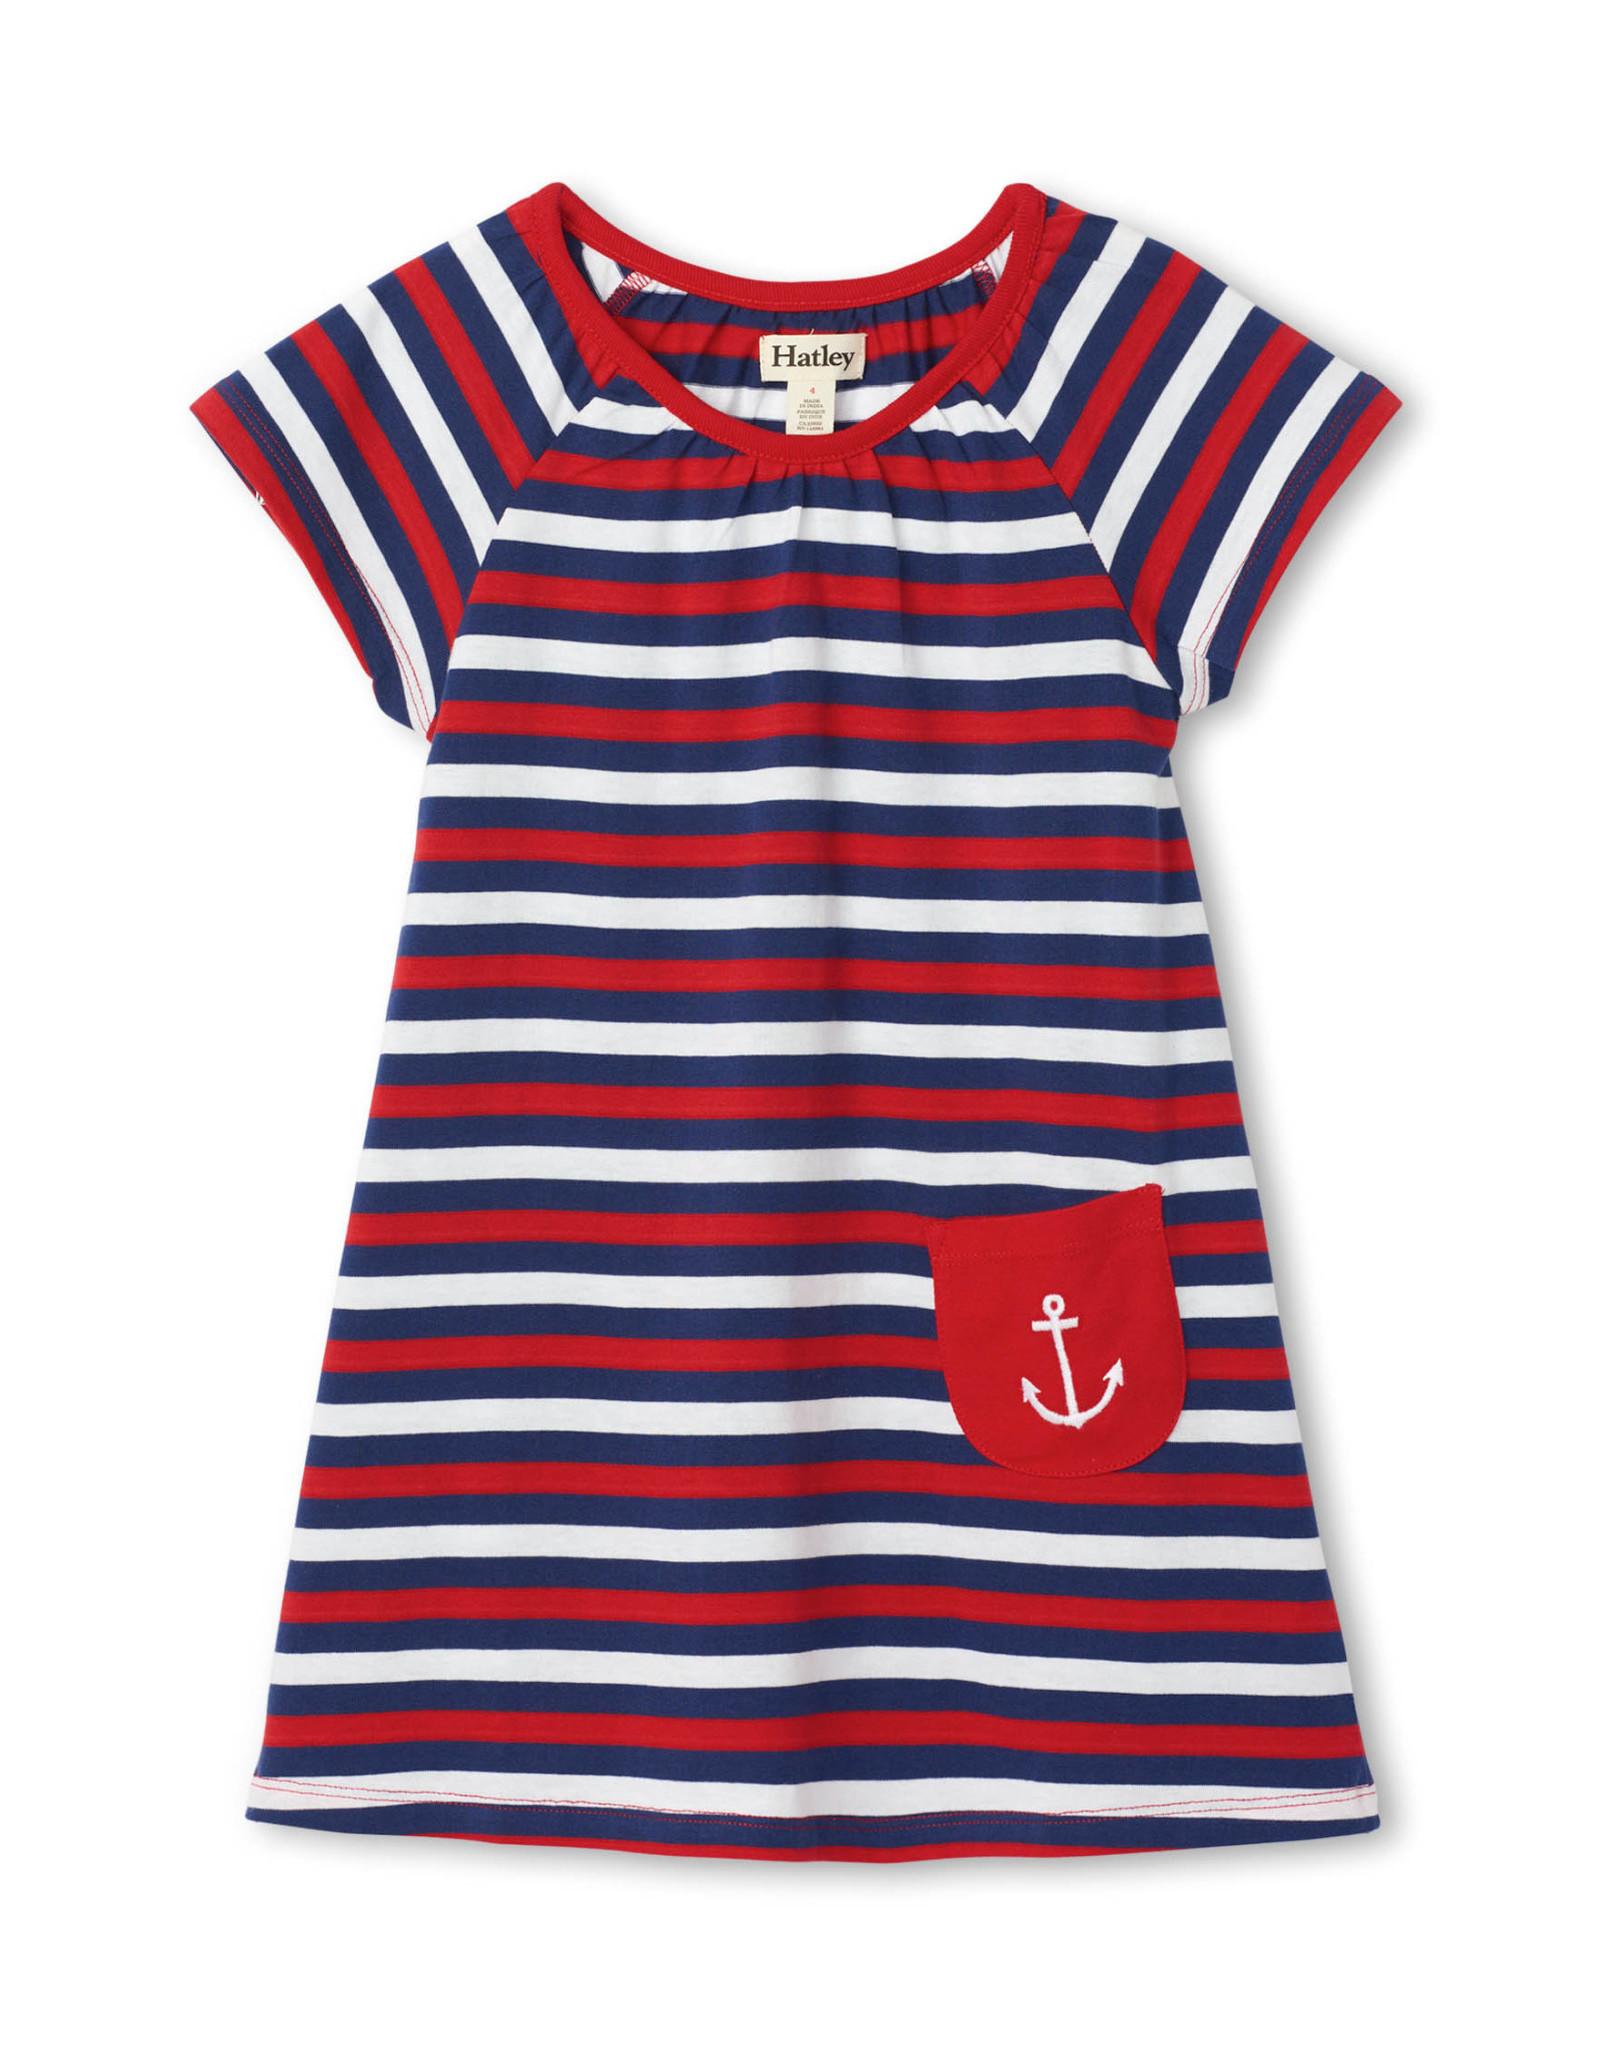 Hatley Nautical Stripes Tee Shirt Dress